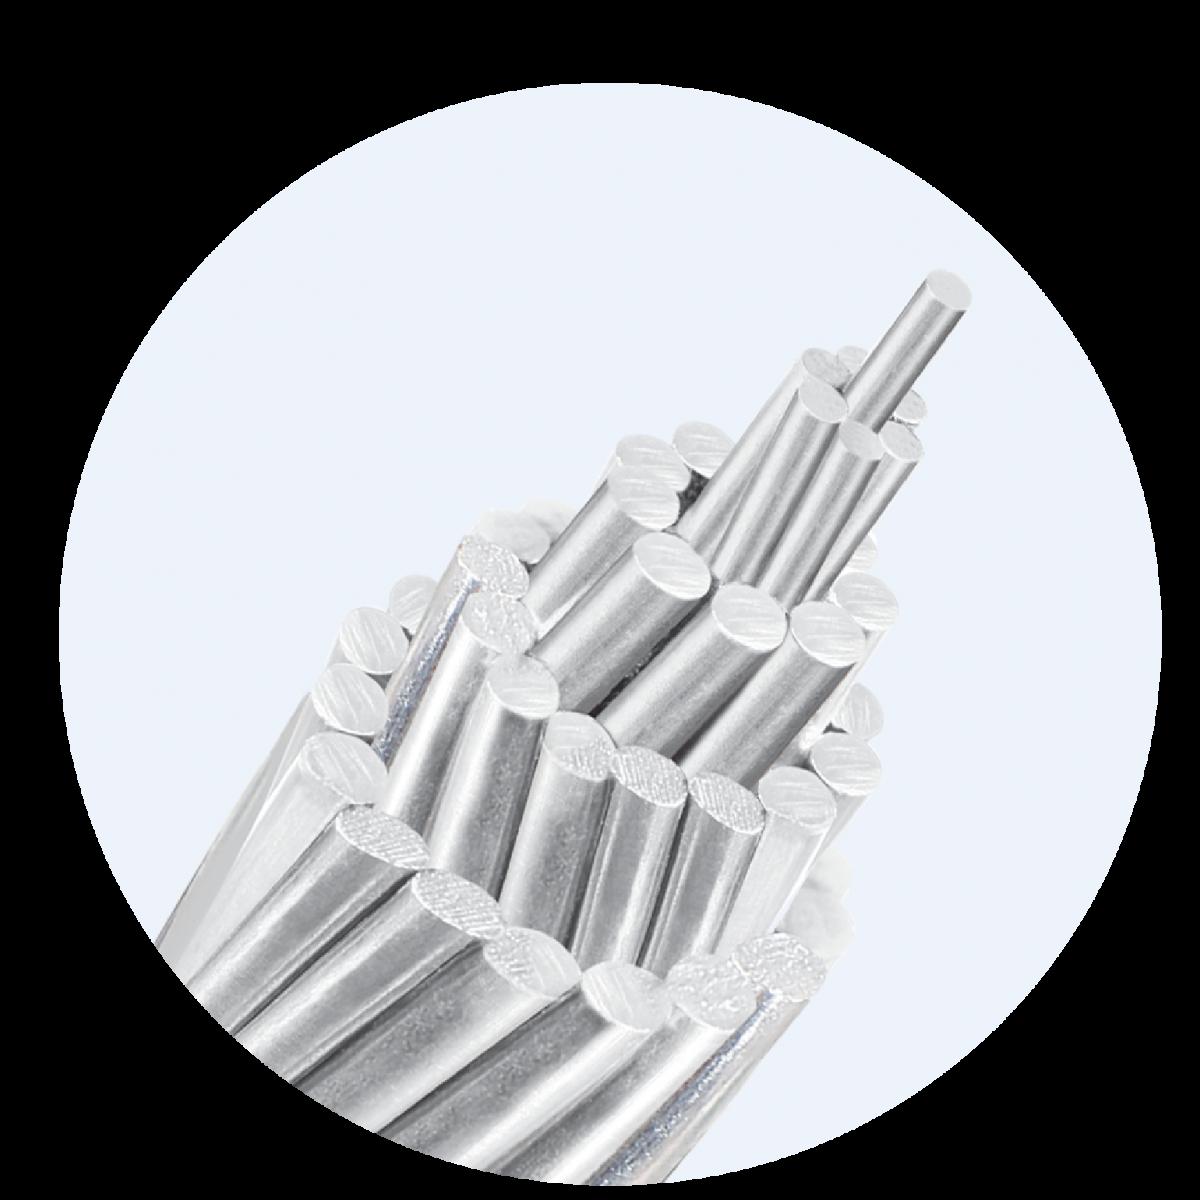 Aluminum alloy steel core wire